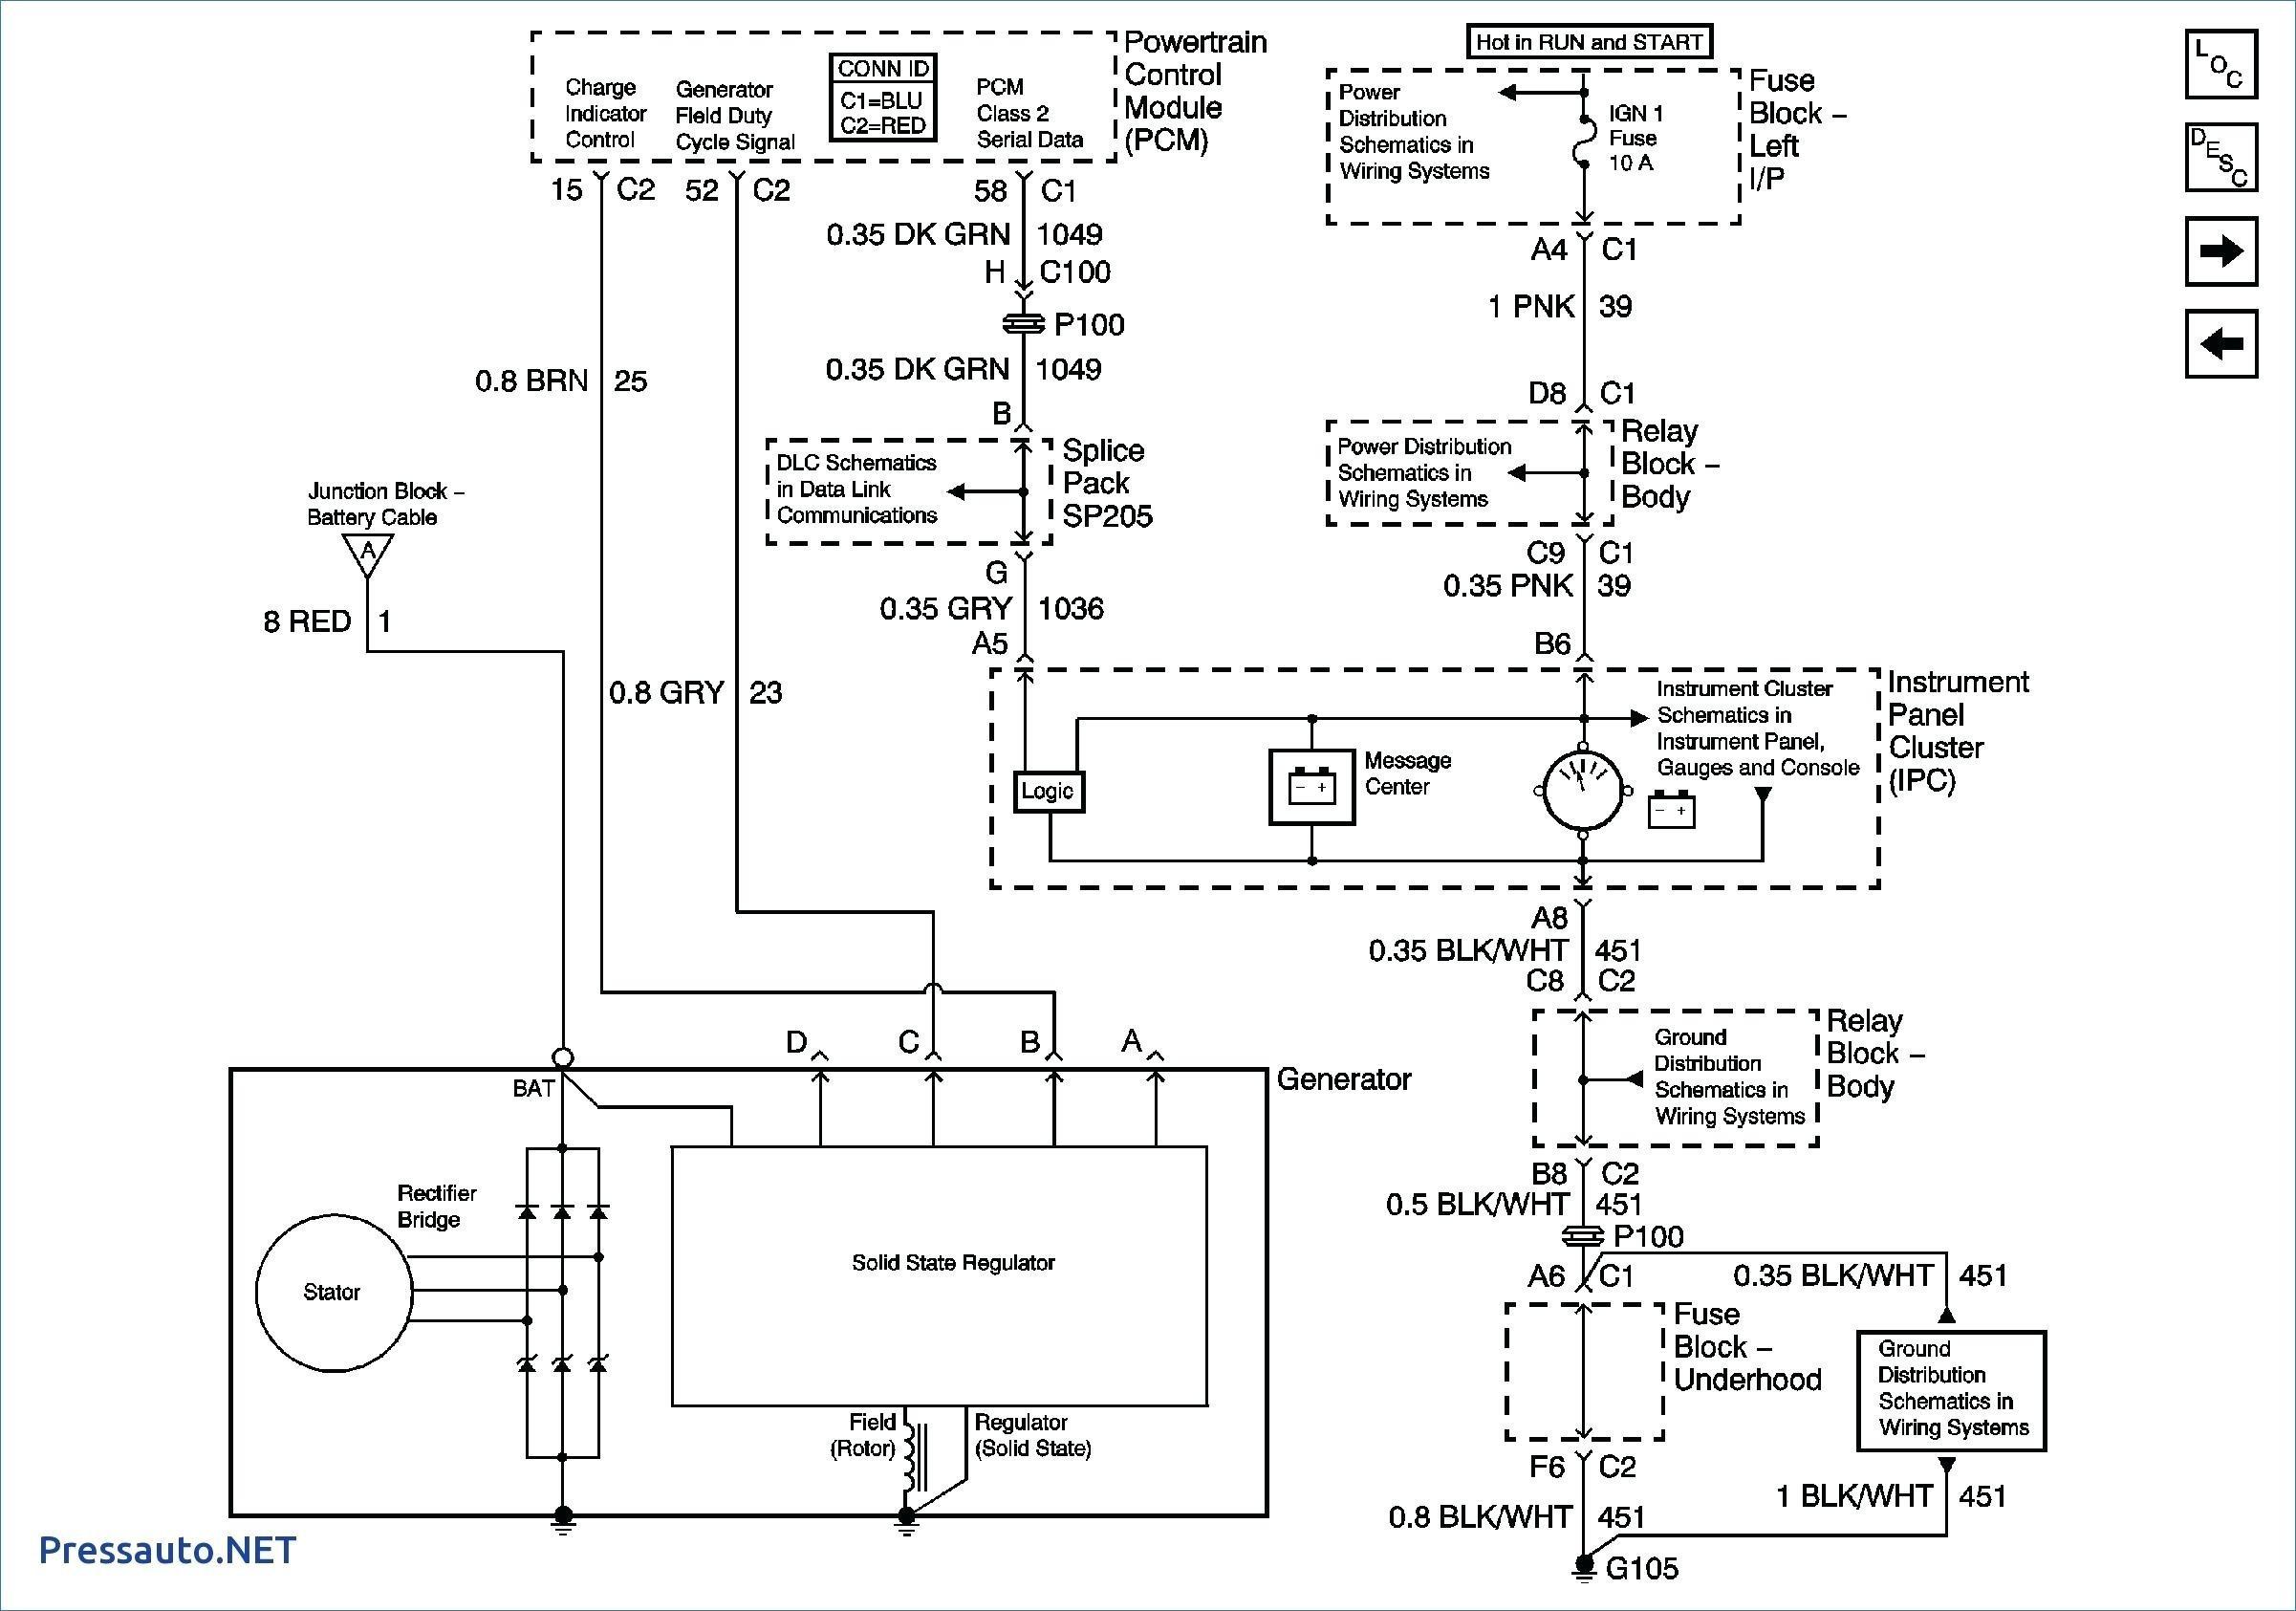 chevy alternator wiring diagram elegant wiring diagram image rh mainetreasurechest com 2006 chevy colorado alternator wiring diagram GM 1-Wire Alternator Wiring Diagram